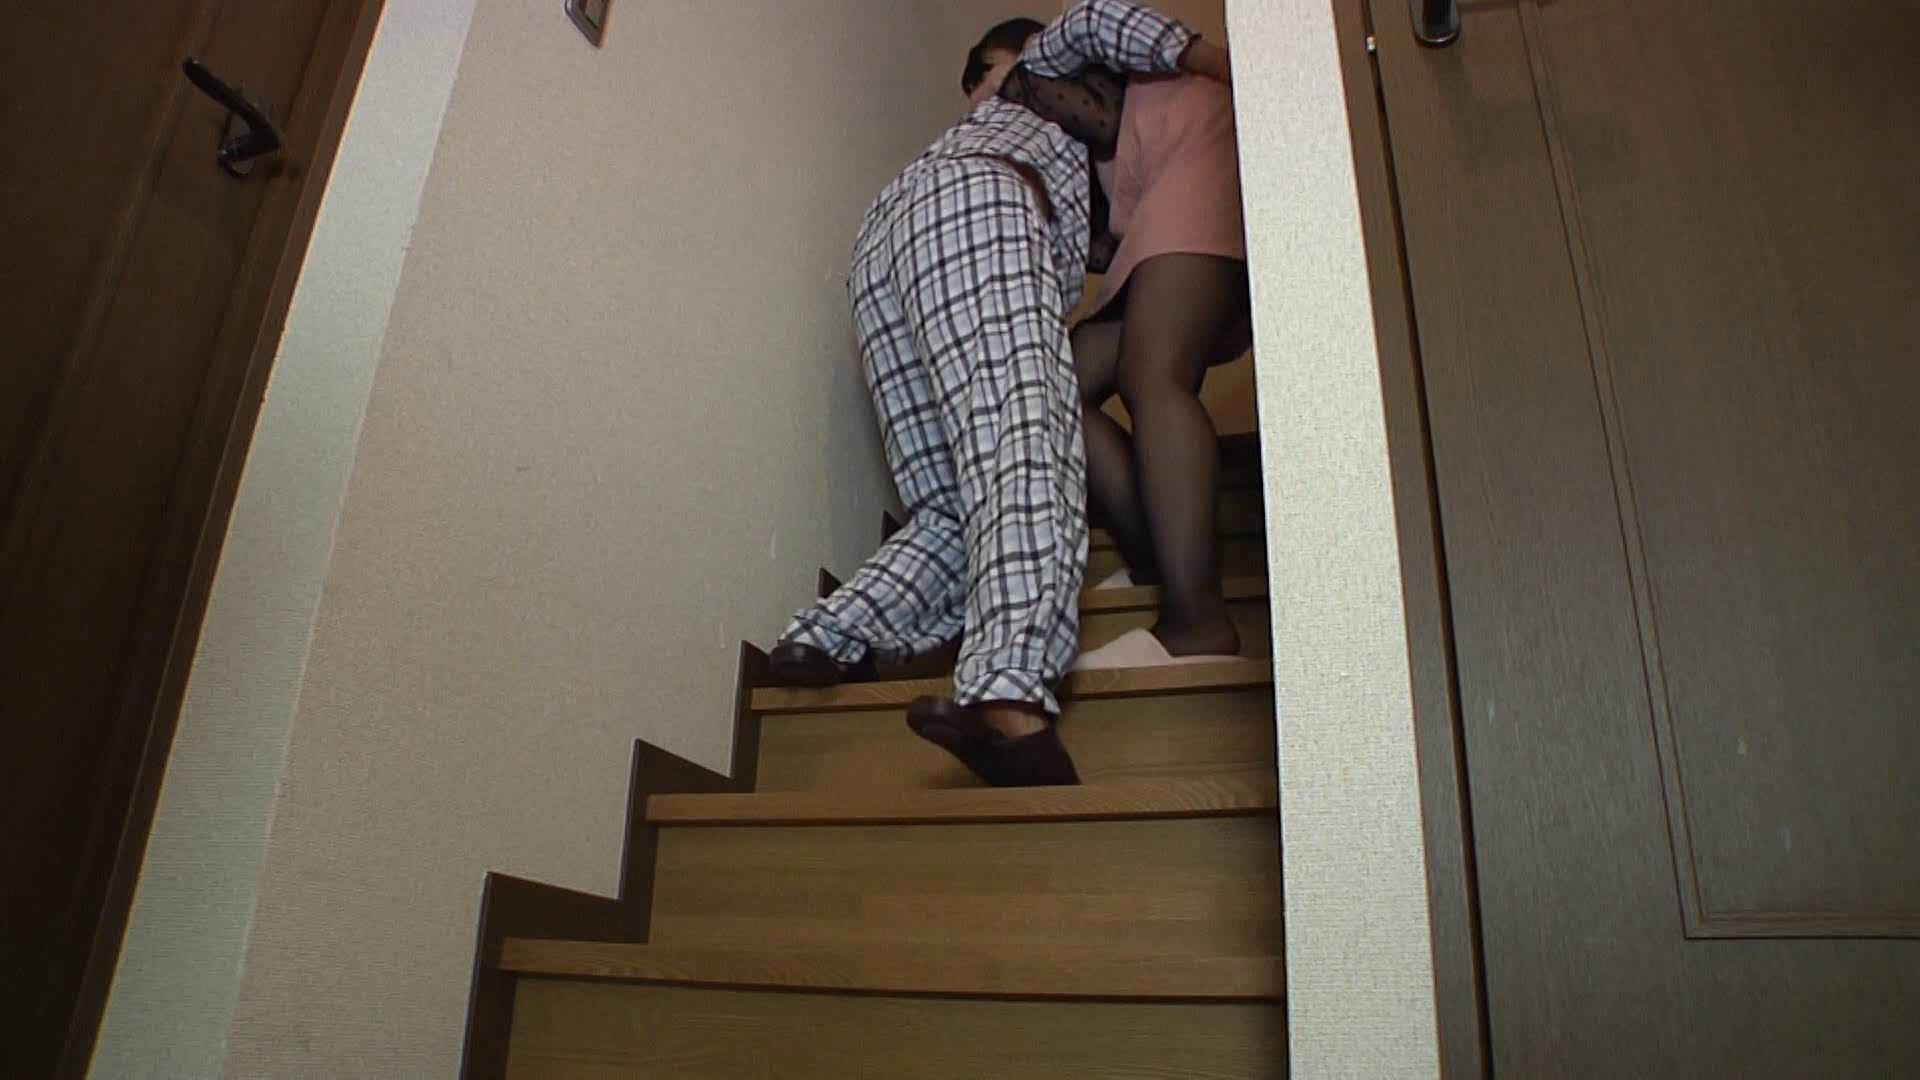 Unusual_fainting_in_agony_Shizuka_Part_2-Shizuka_Kano.wmv.00004.jpg